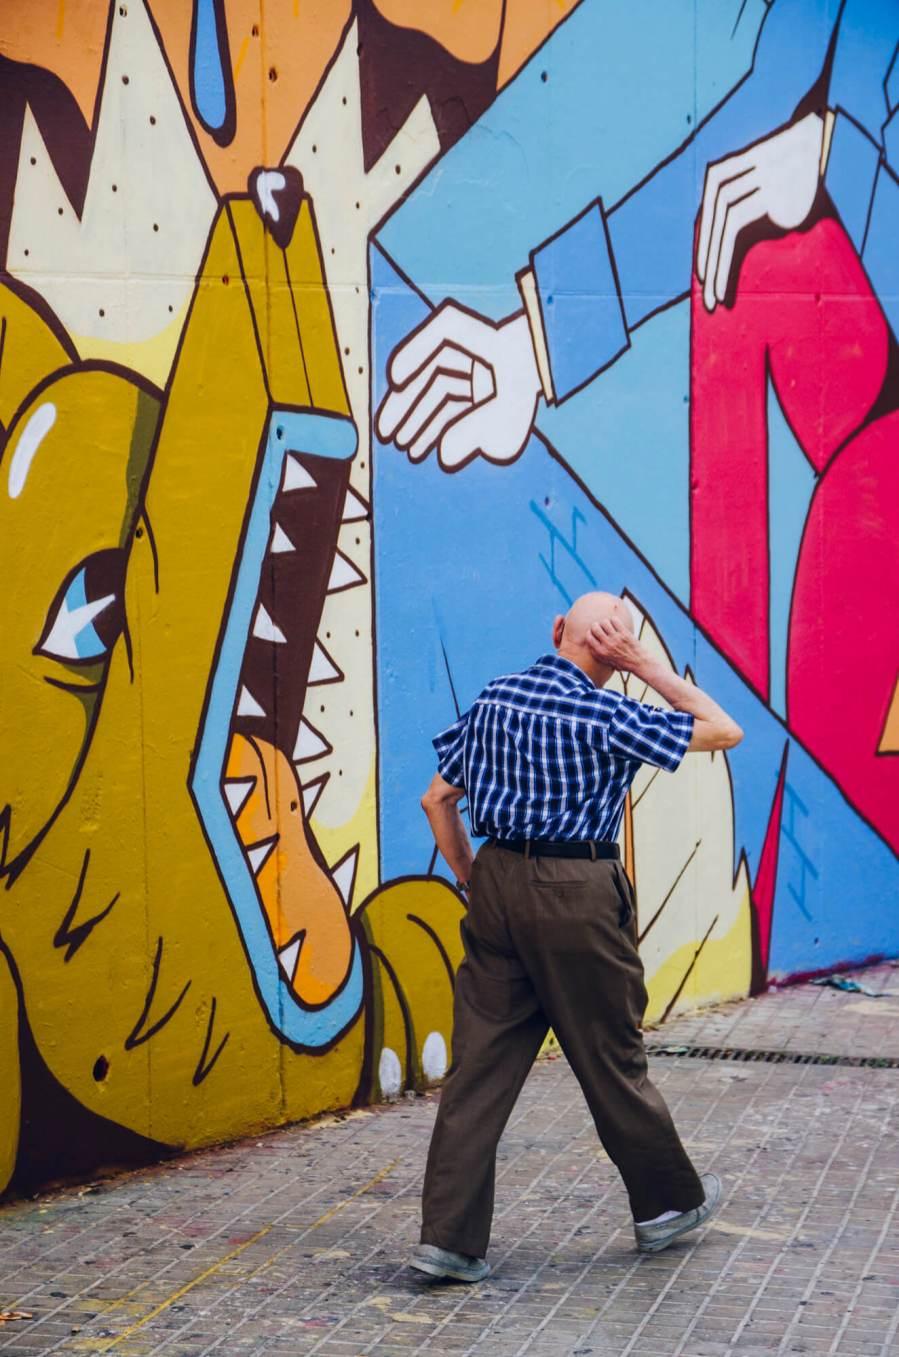 Greediness-street-art-mural-FERNANDO-LEON-urban-art-l'Hospitalet-de-Llobregat-Barcelona-pc-Contorno-Urbano-